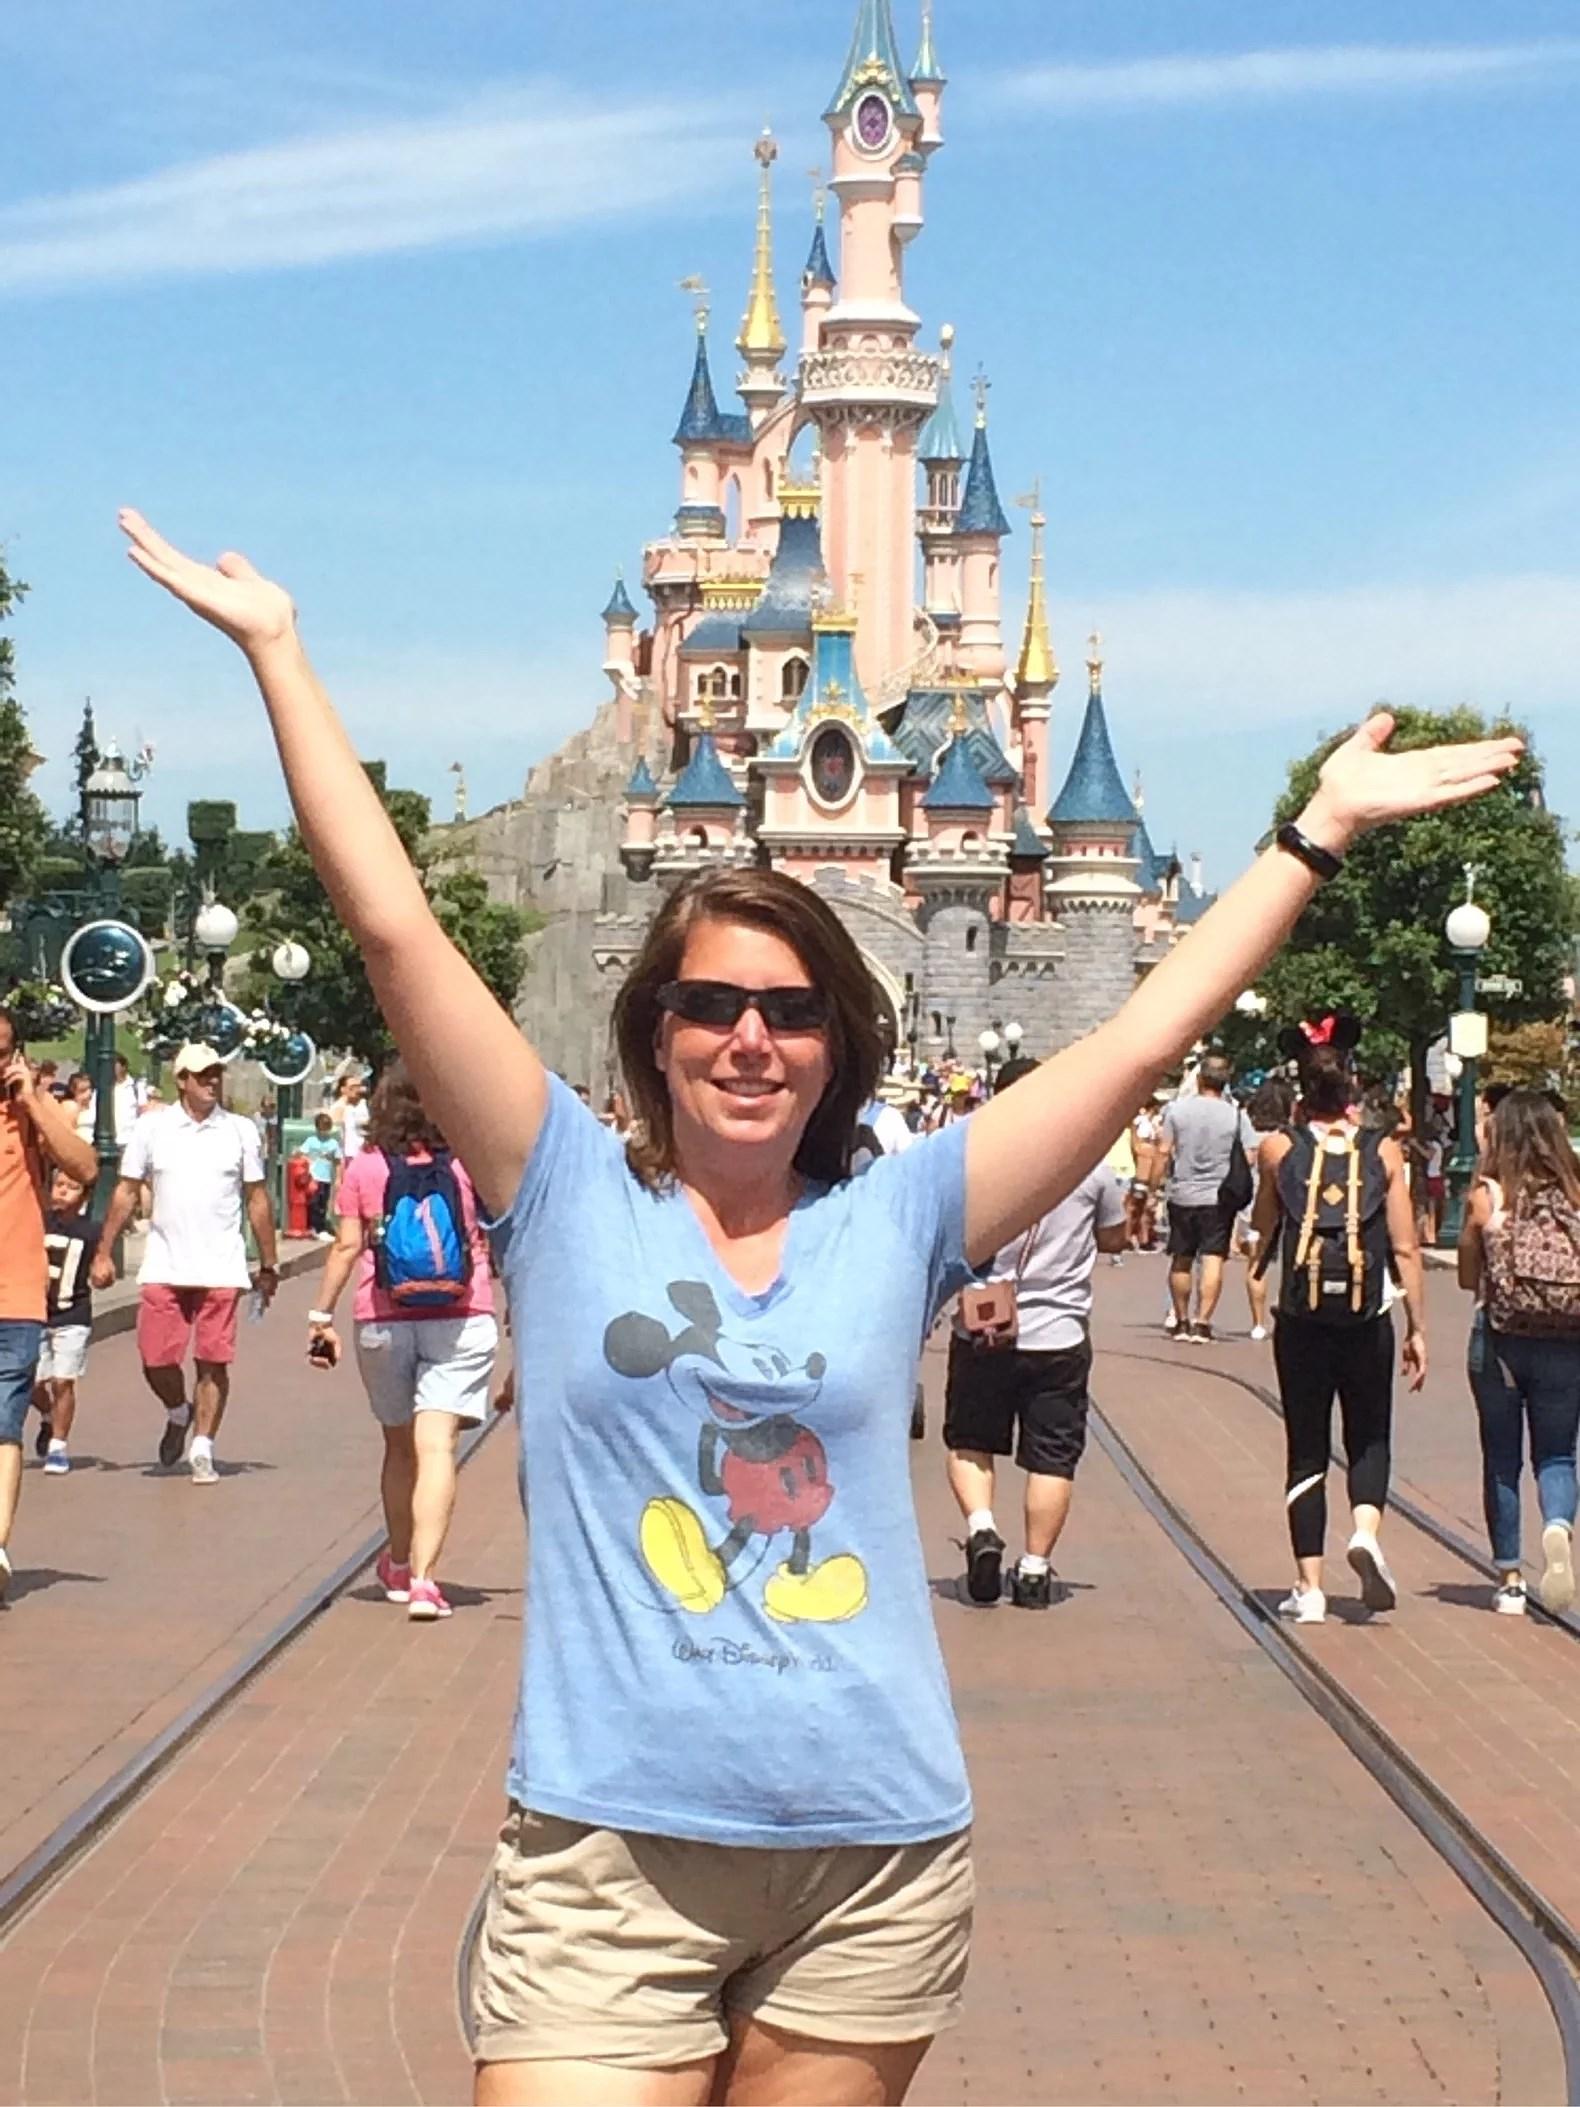 Kan jag ta med en Selfie-stick / selfiepinnetill Disneyland Paris? (EuroDisney)